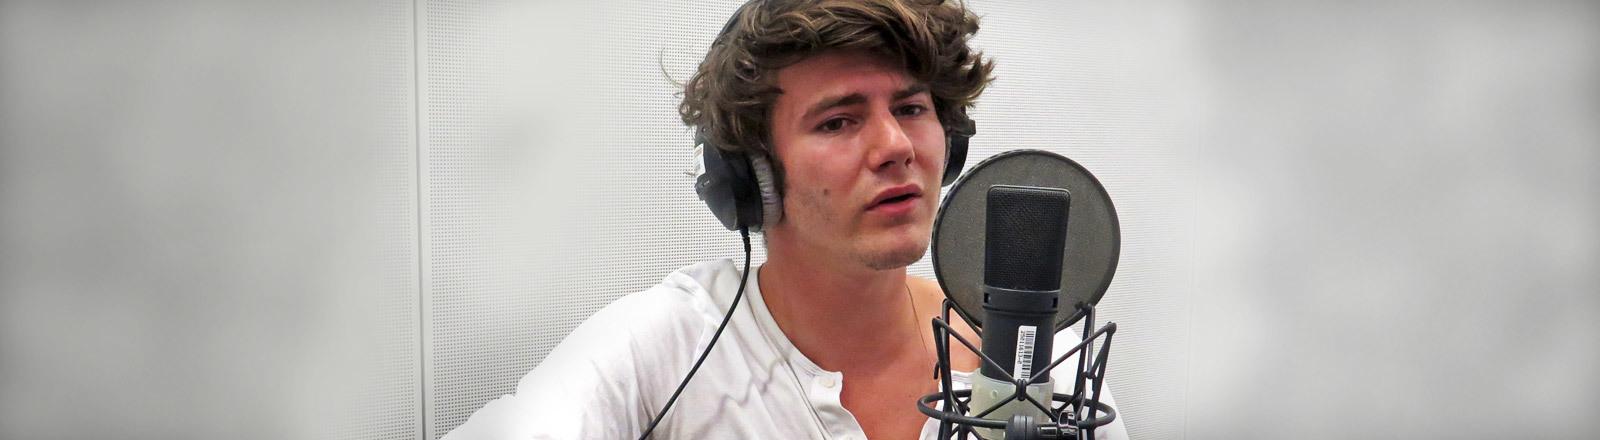 Musiker Faber bei Deutschlandfunk Nova